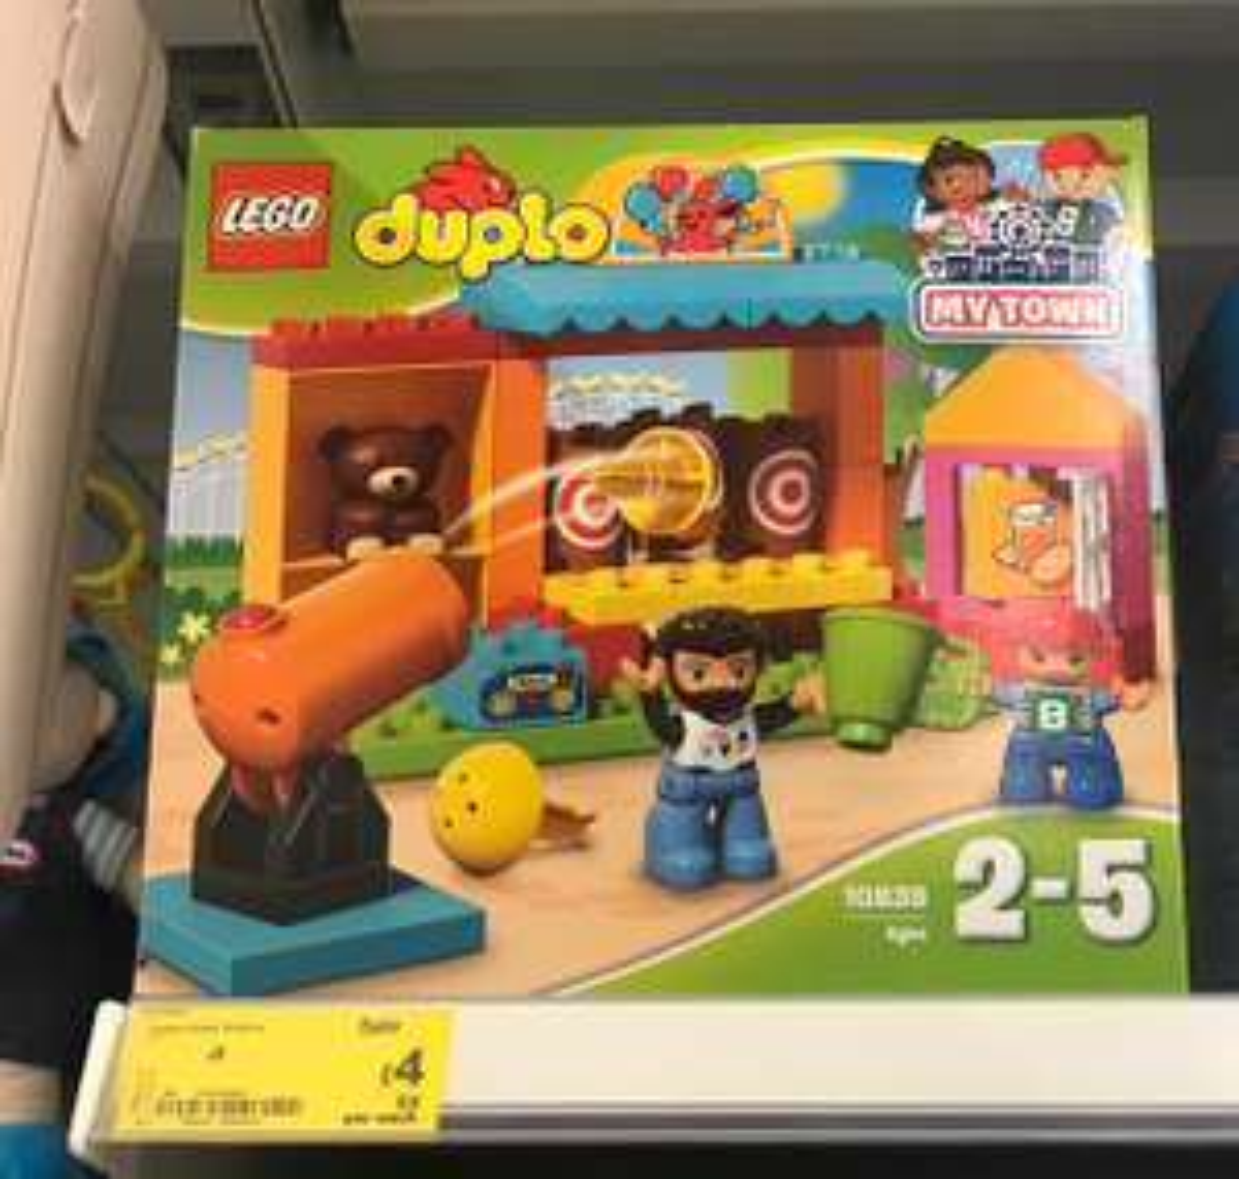 Lego Duplo 10839 Shooting Gallery - £4 @ Asda Hyson Green, Nottingham